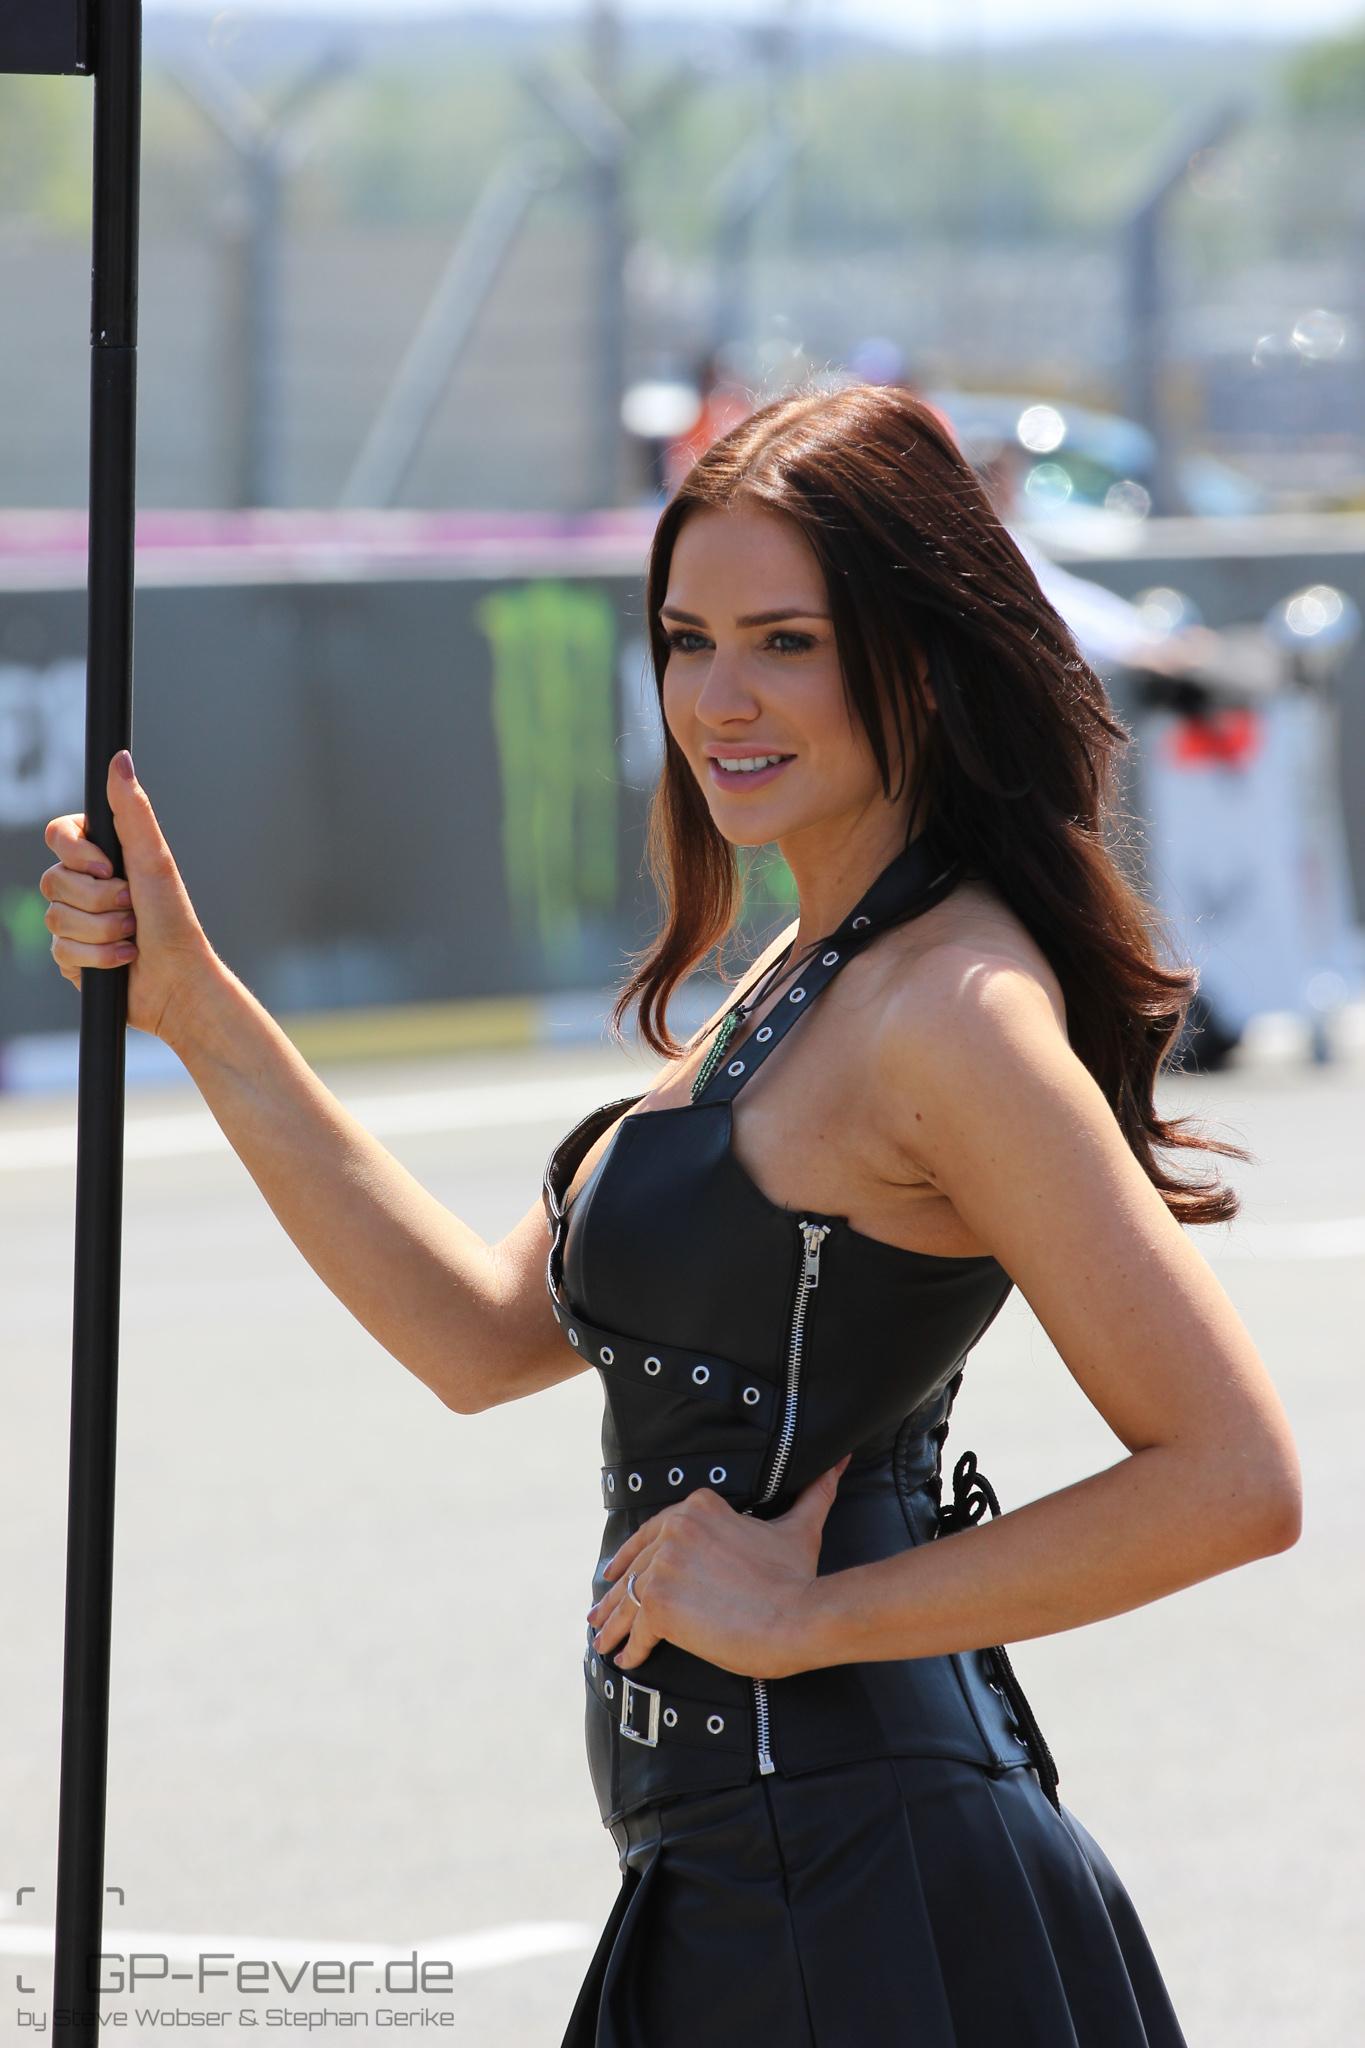 GP fever Monstergirls Monster Girls Le Mans LeMans MotoGP